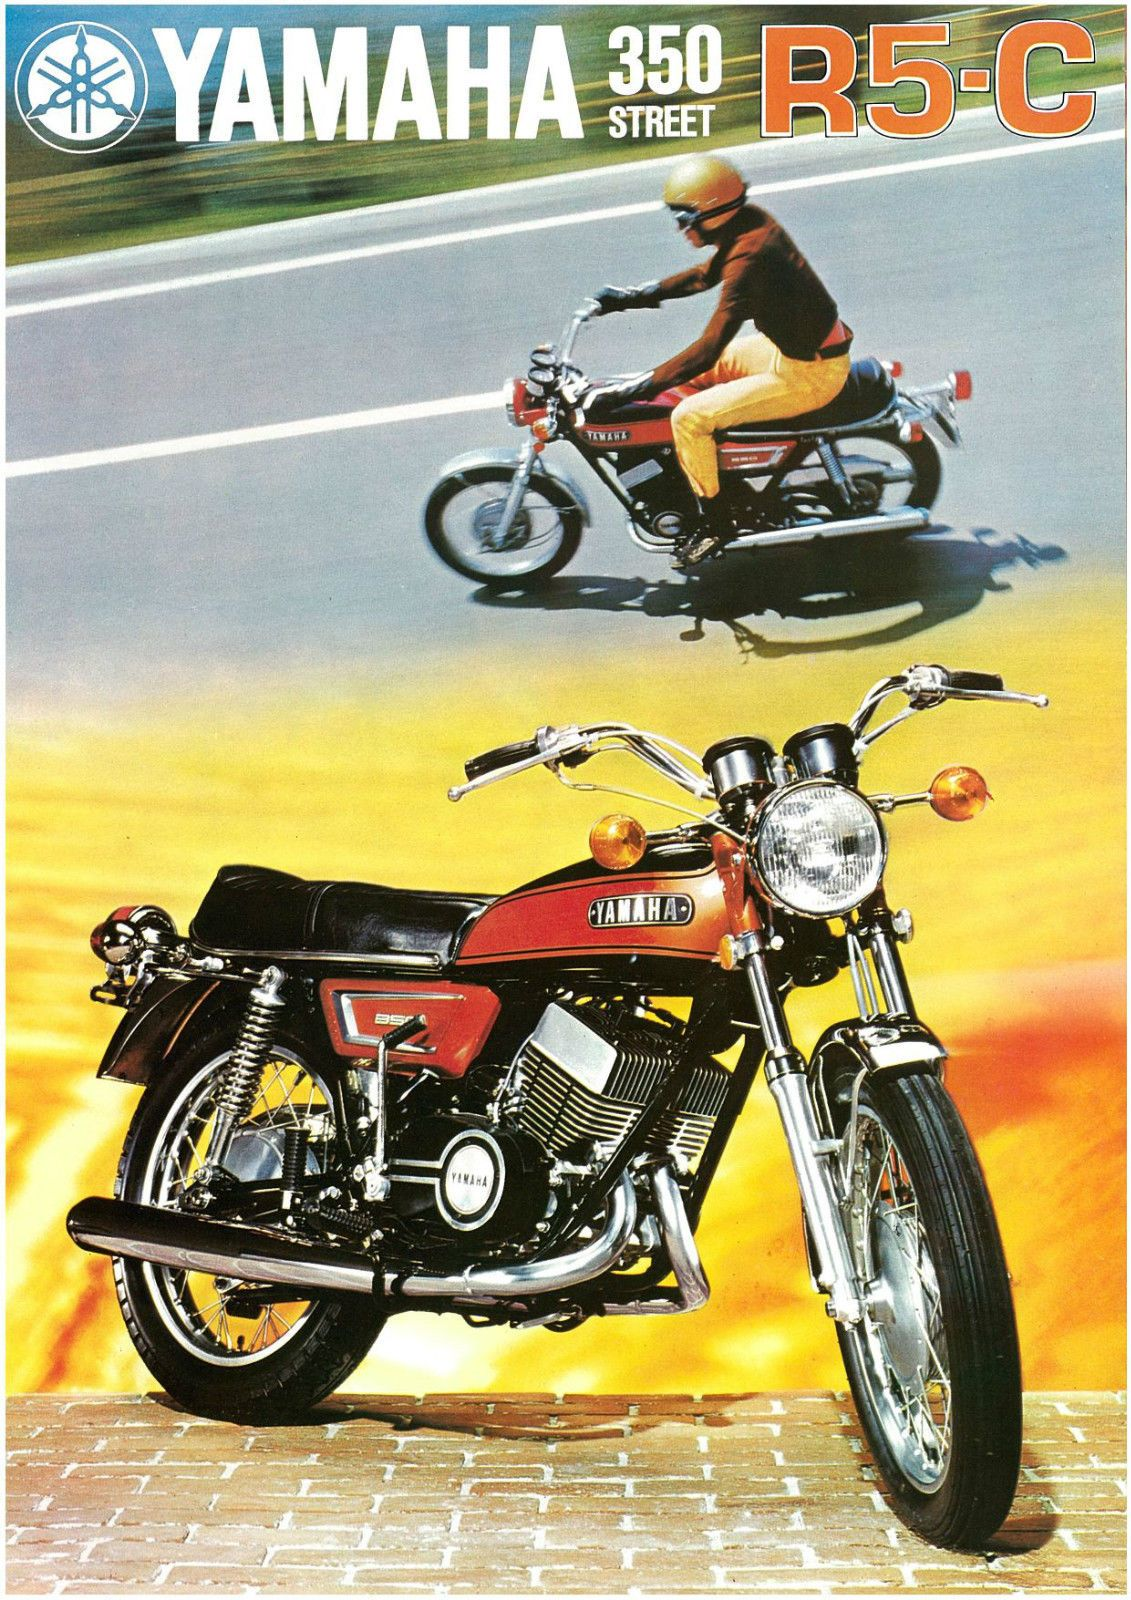 Yamaha Brochure R5 R5c R5 C 1972 Sales Catalog Catalogue Repro Rd350 Yamaha Yamaha Bikes Yamaha Motor